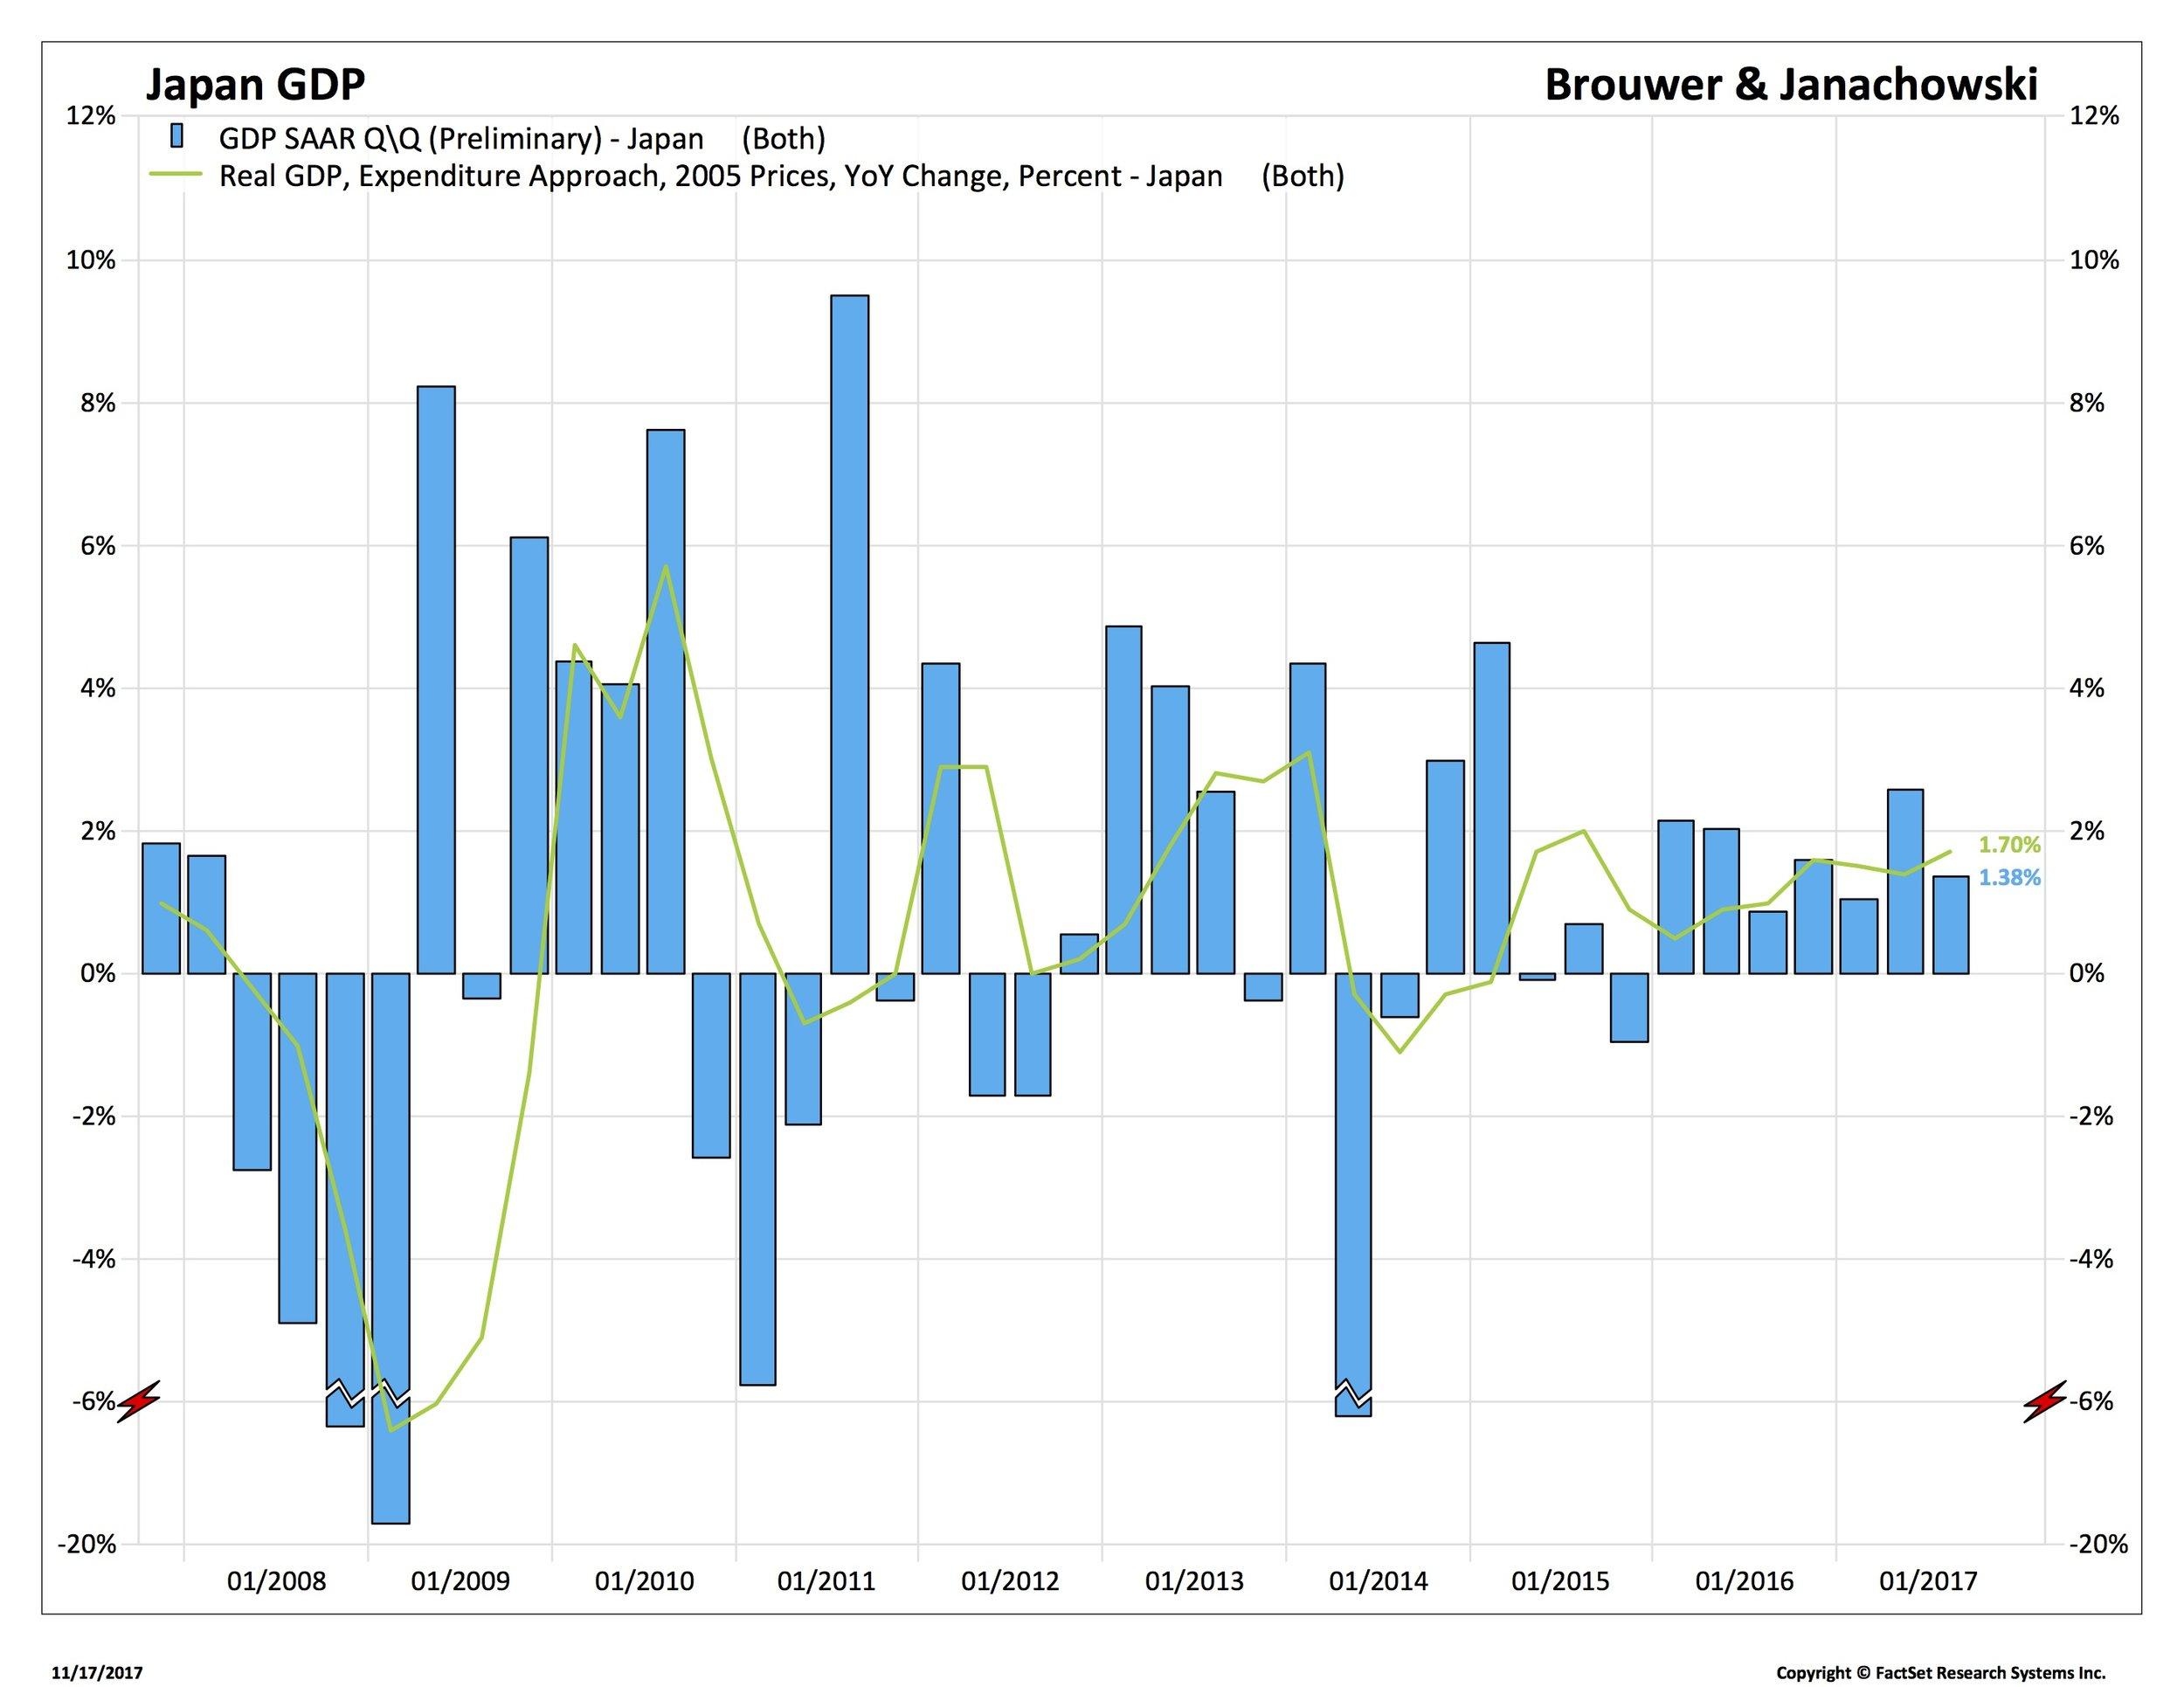 Blog 1 11-17-17JP - GDP SAAR QQ (Preliminary)_.jpg